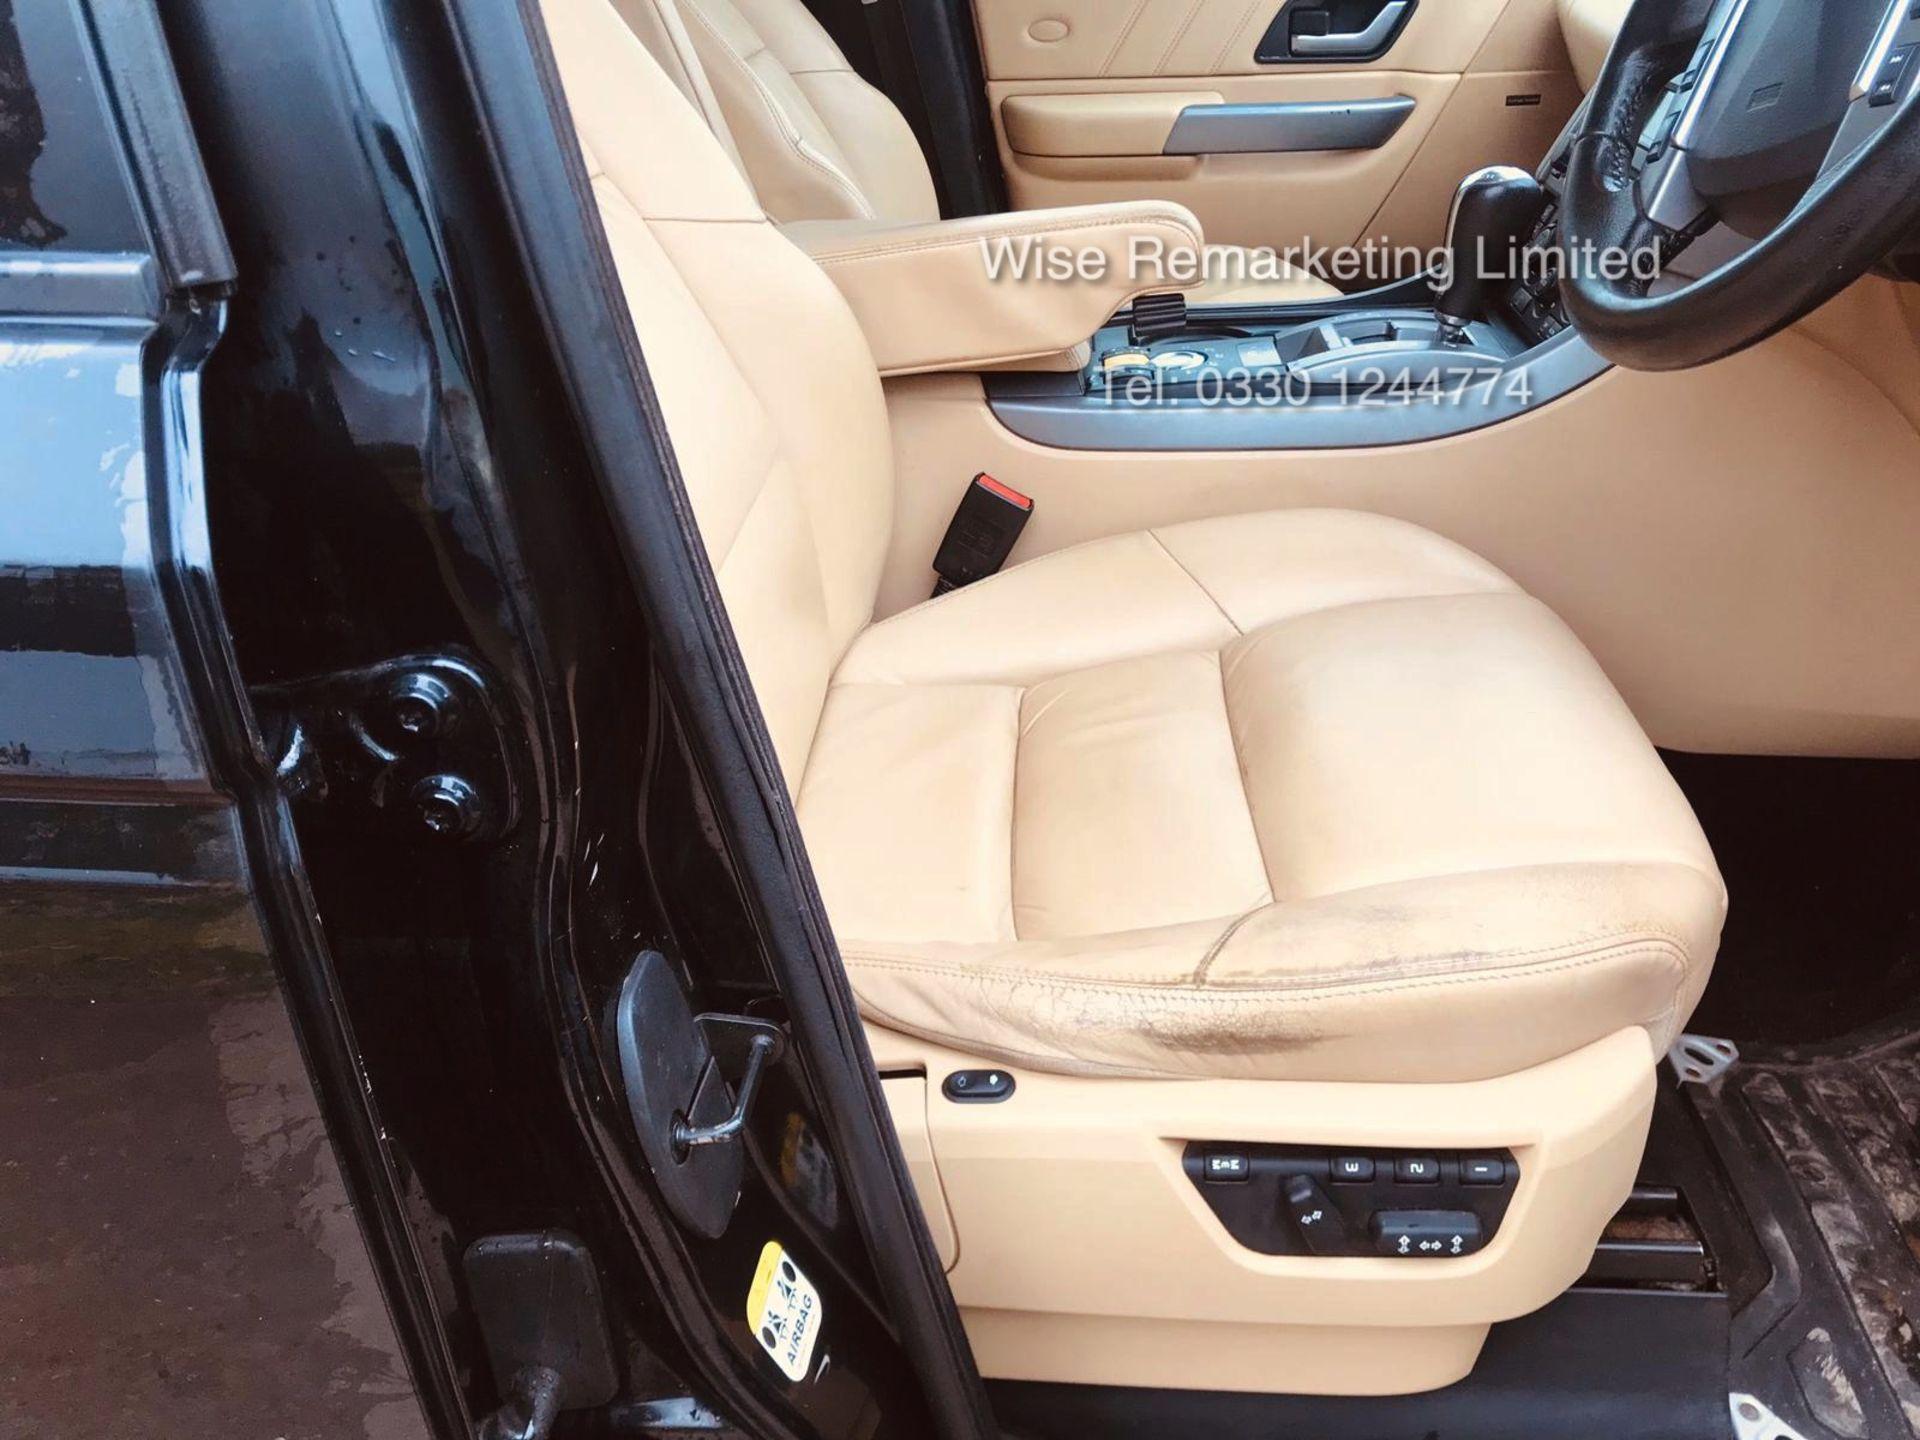 Range Rover Sport 2.7 TDV6 HSE Auto - 2008 Model - Cream Leather - Sat Nav - Heated Seats - Image 9 of 19